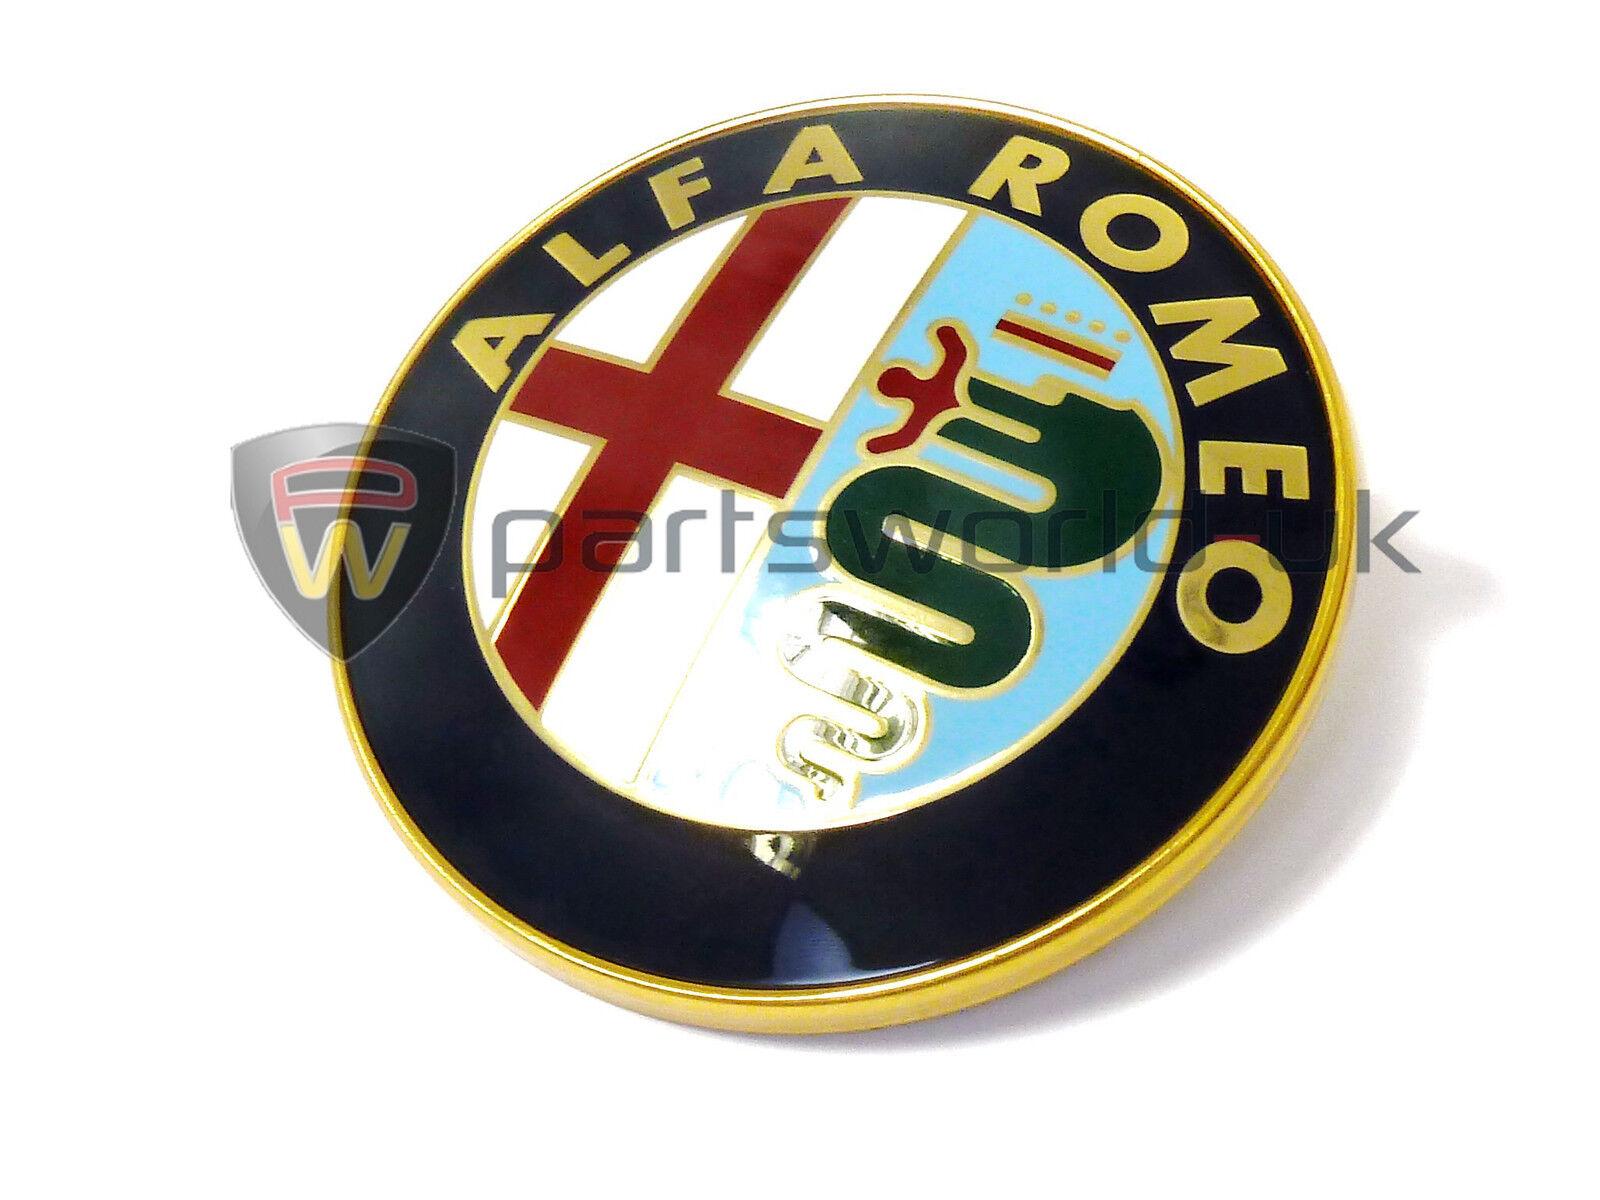 CLASSIC ALFA ROMEO ENAMEL LACQUERED FRONT BADGE LOGO EMBLEM BRAND NEW